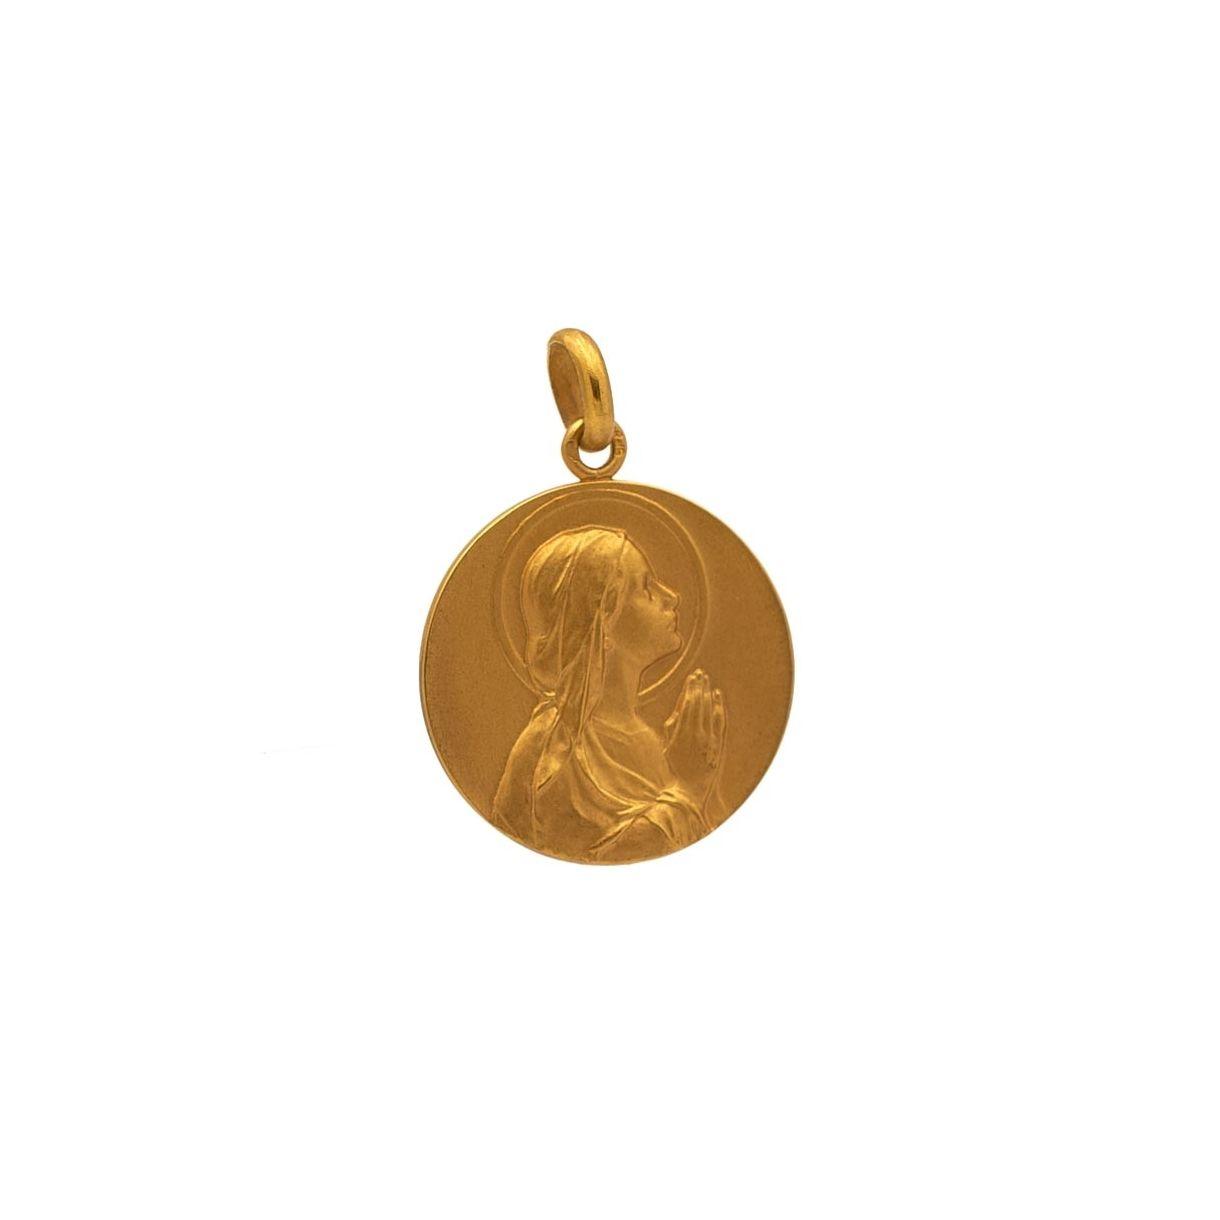 Medalla con imagen de Virgen niña